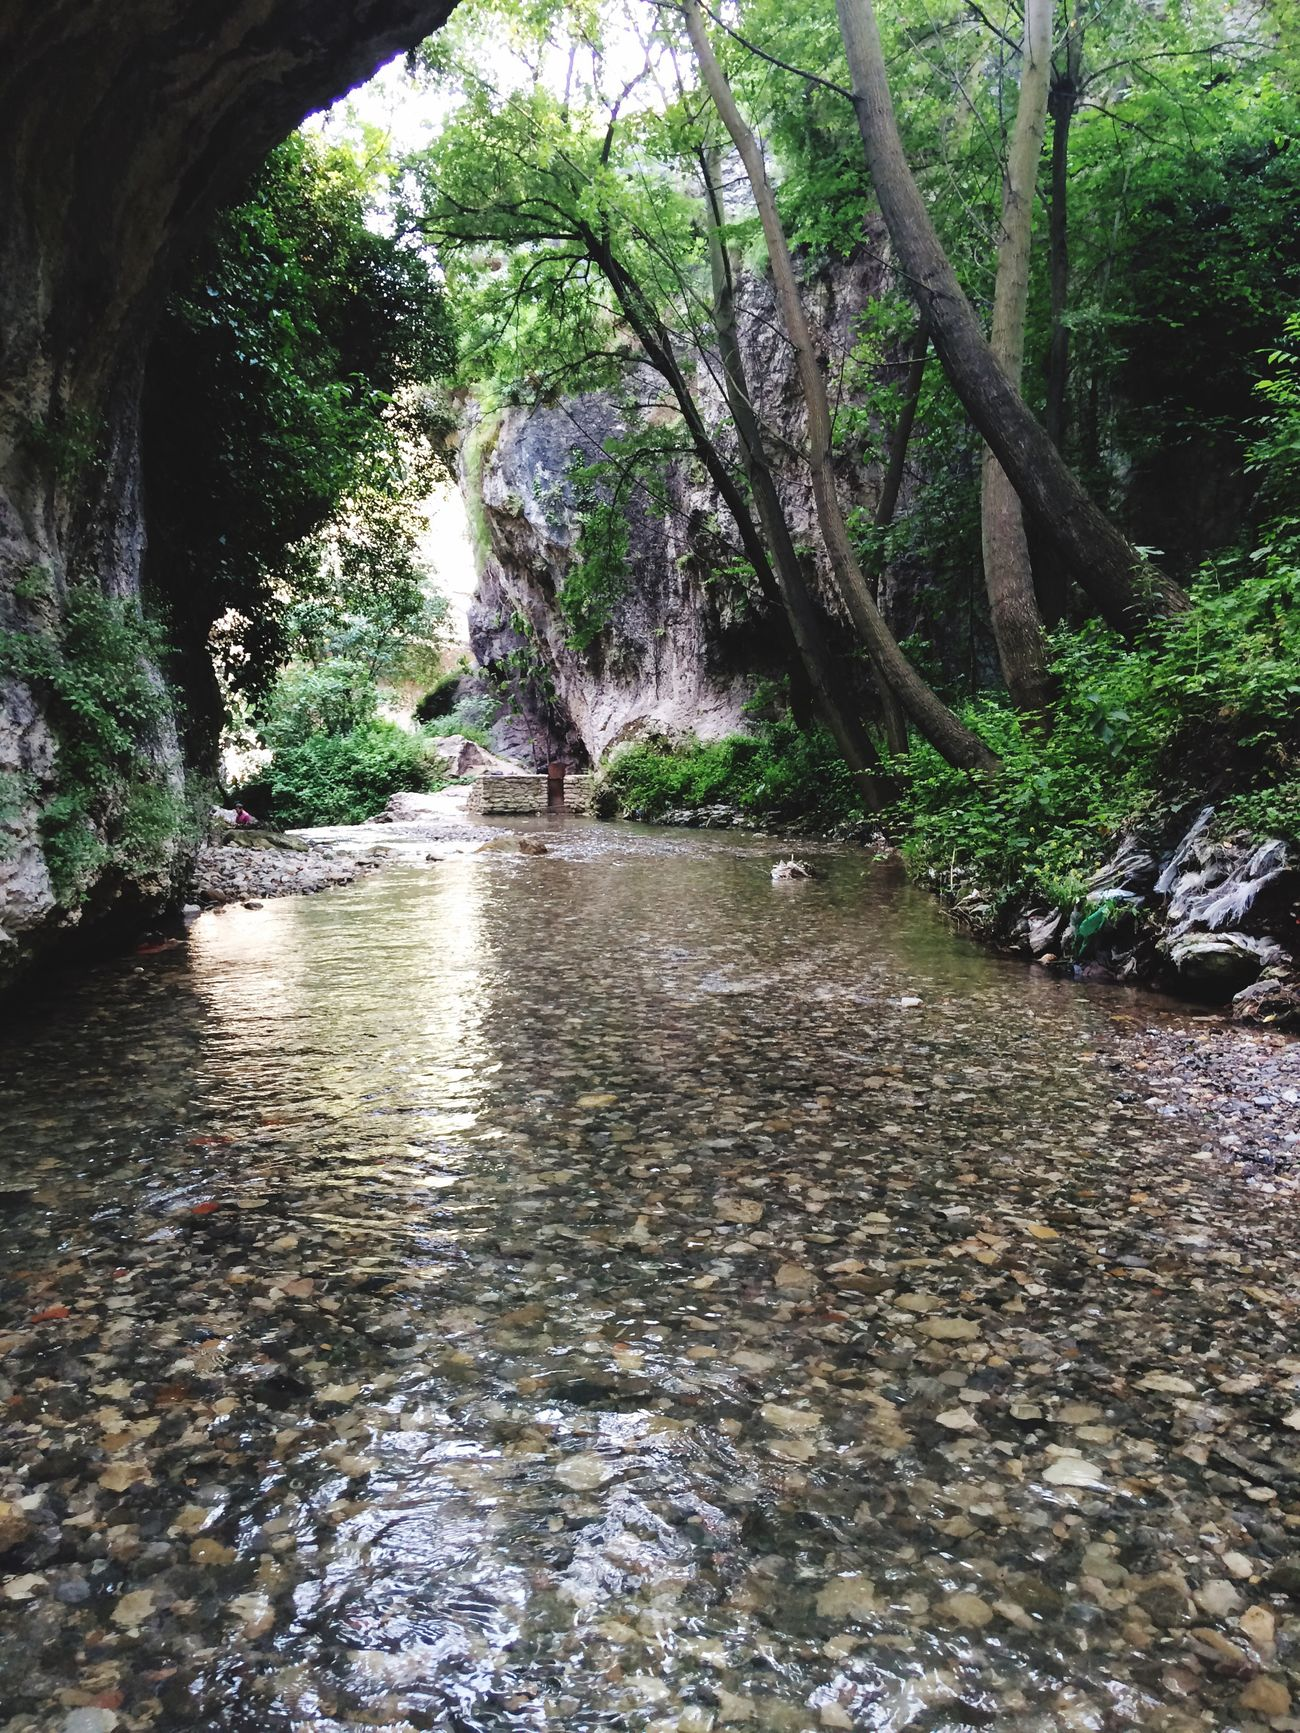 Doğa Dere çay Nehir Safranbolu Eskiçarşı Yeşil Nature Good EyeEm Gallery My Commute